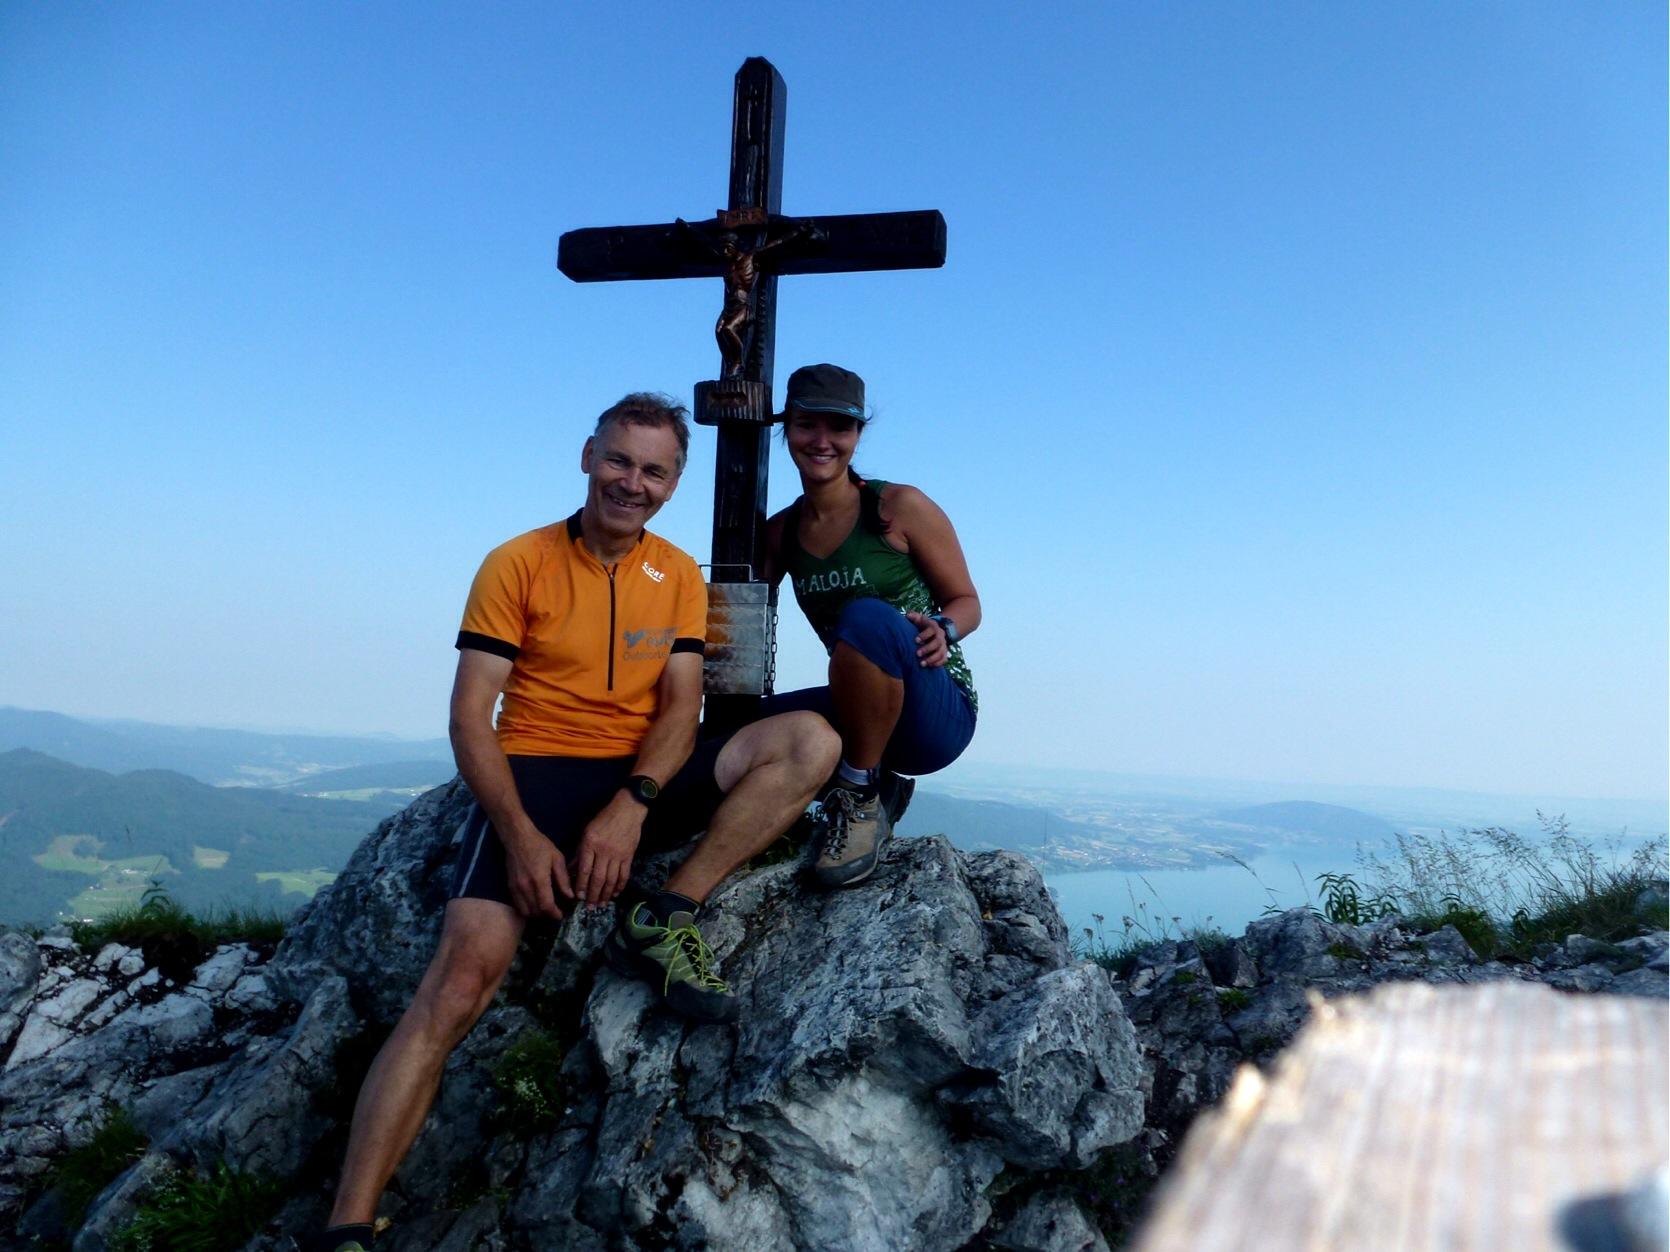 Klettersteig Mahdlgupf : Mahdlgupf klettersteig einsame frühlingshafte winterbesteigung